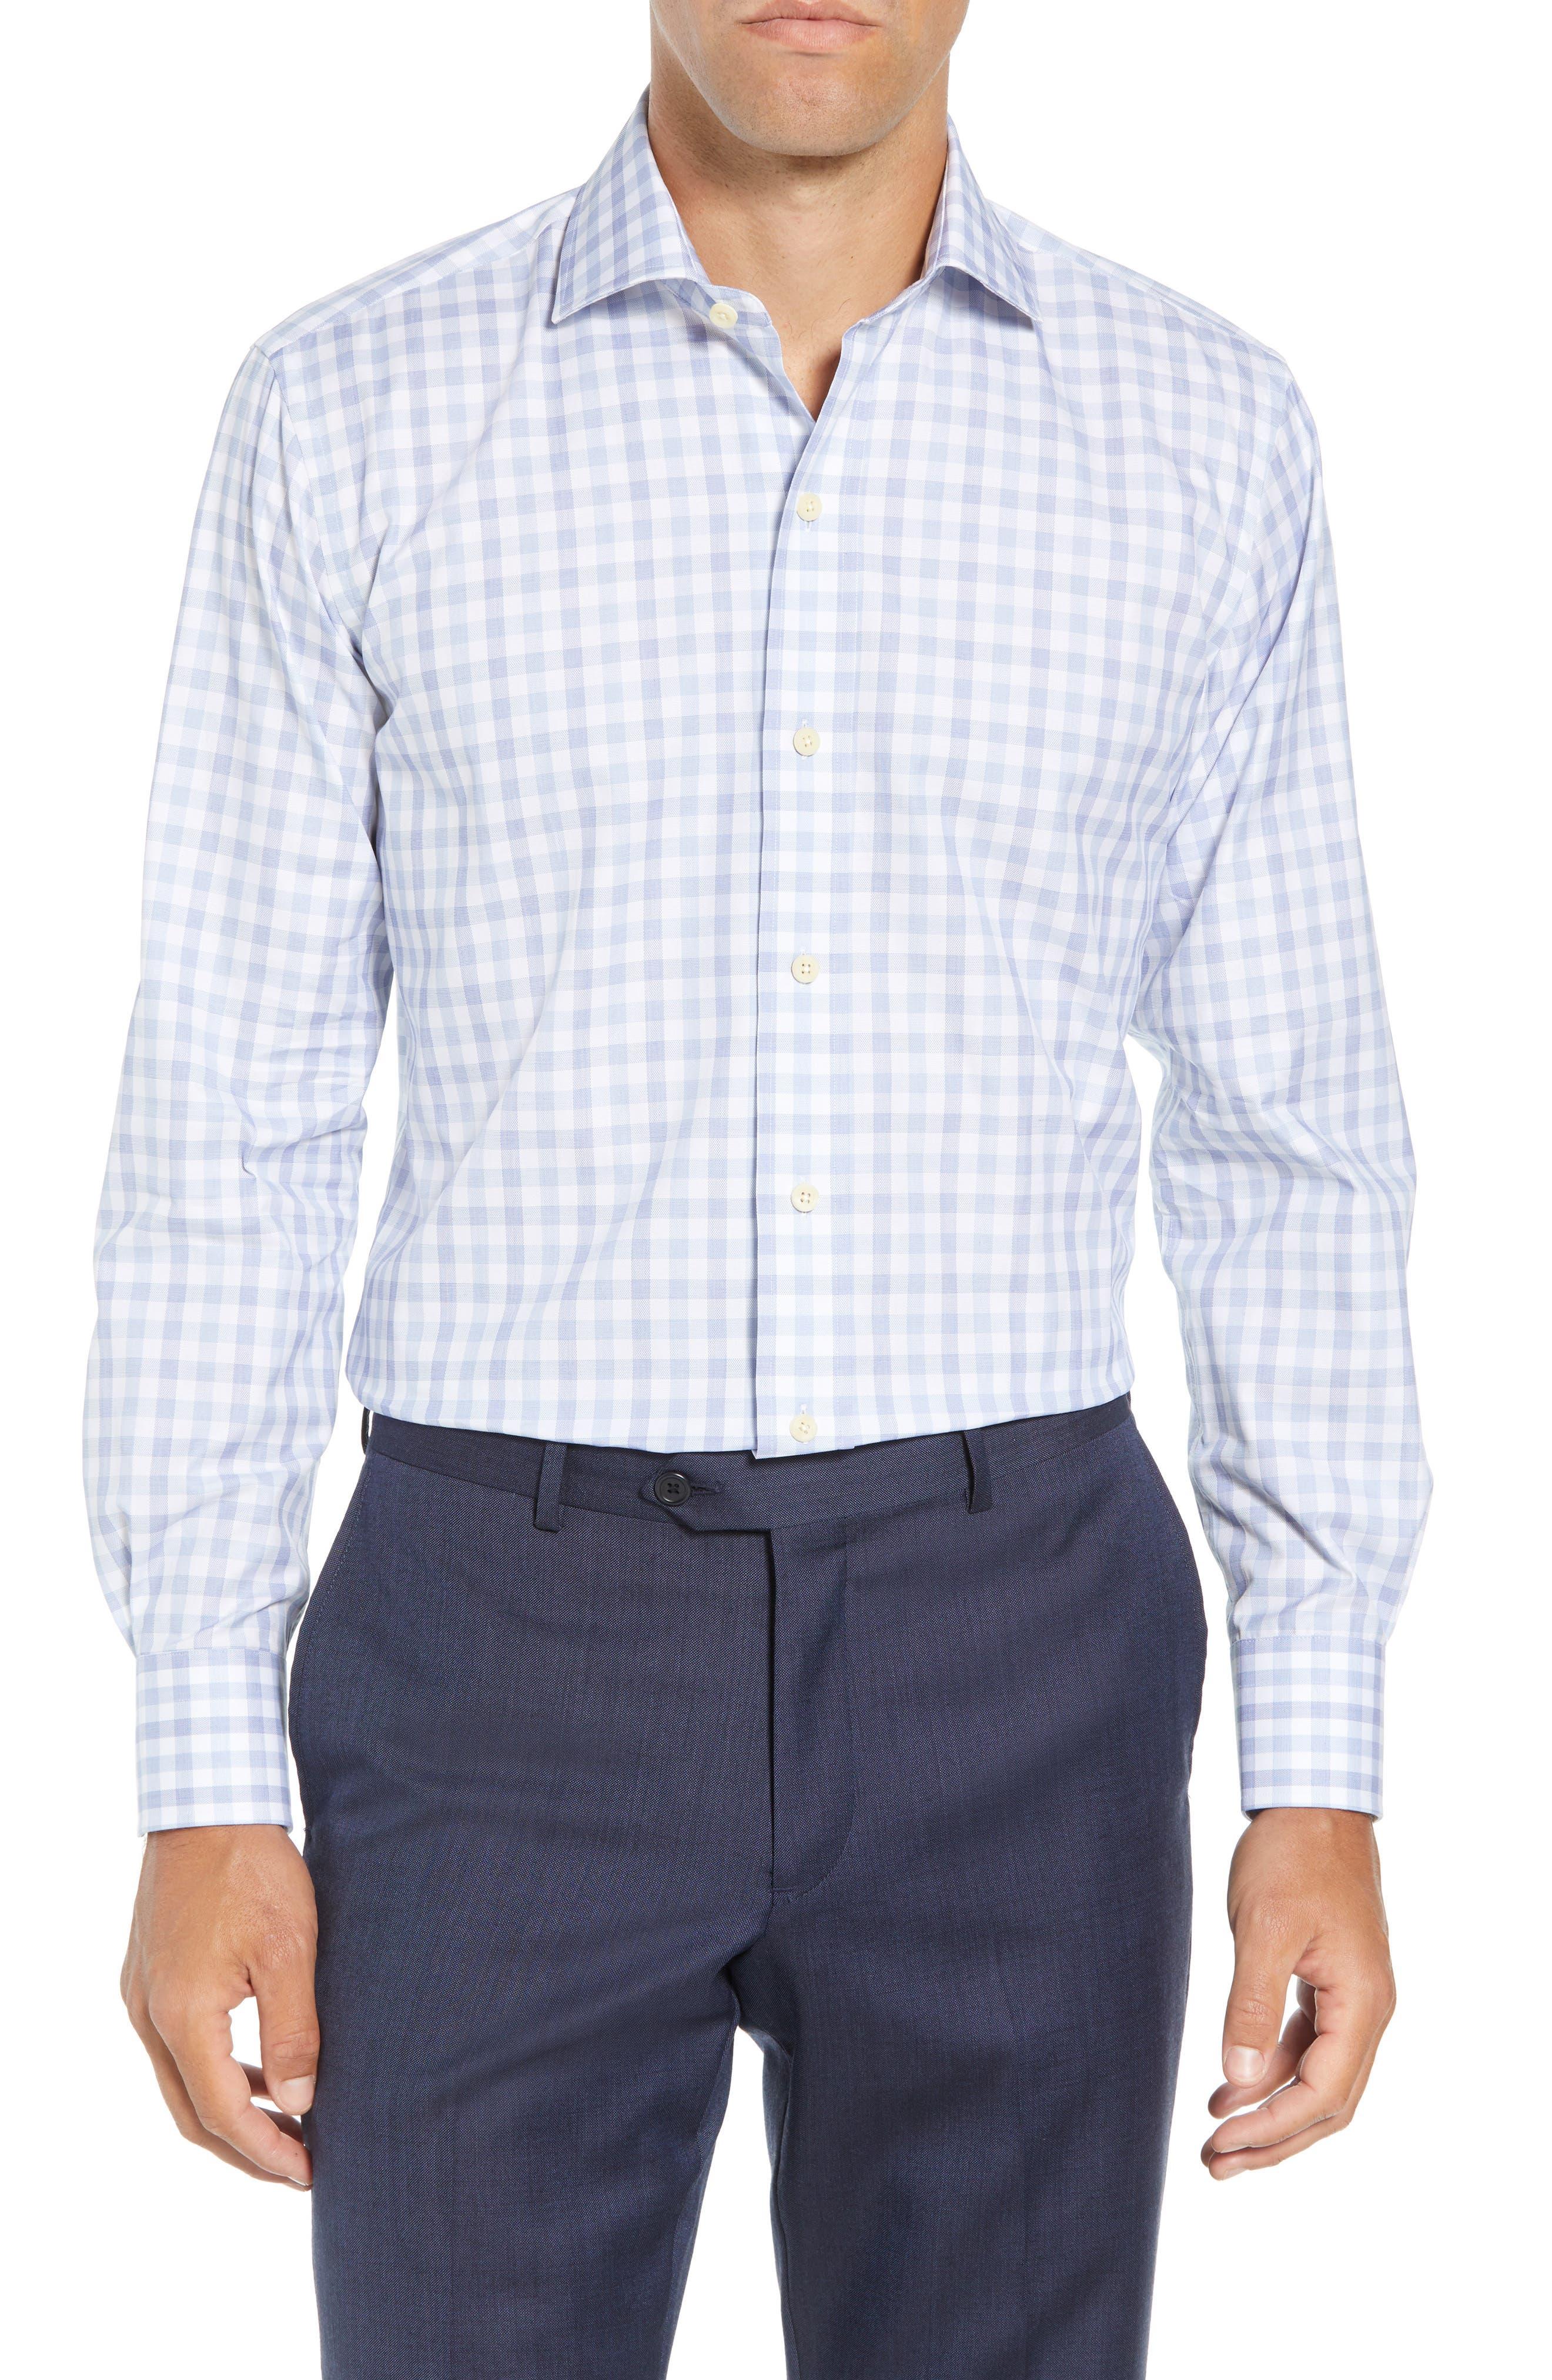 Corbly Trim Fit Check Dress Shirt,                             Main thumbnail 1, color,                             LIGHT BLUE